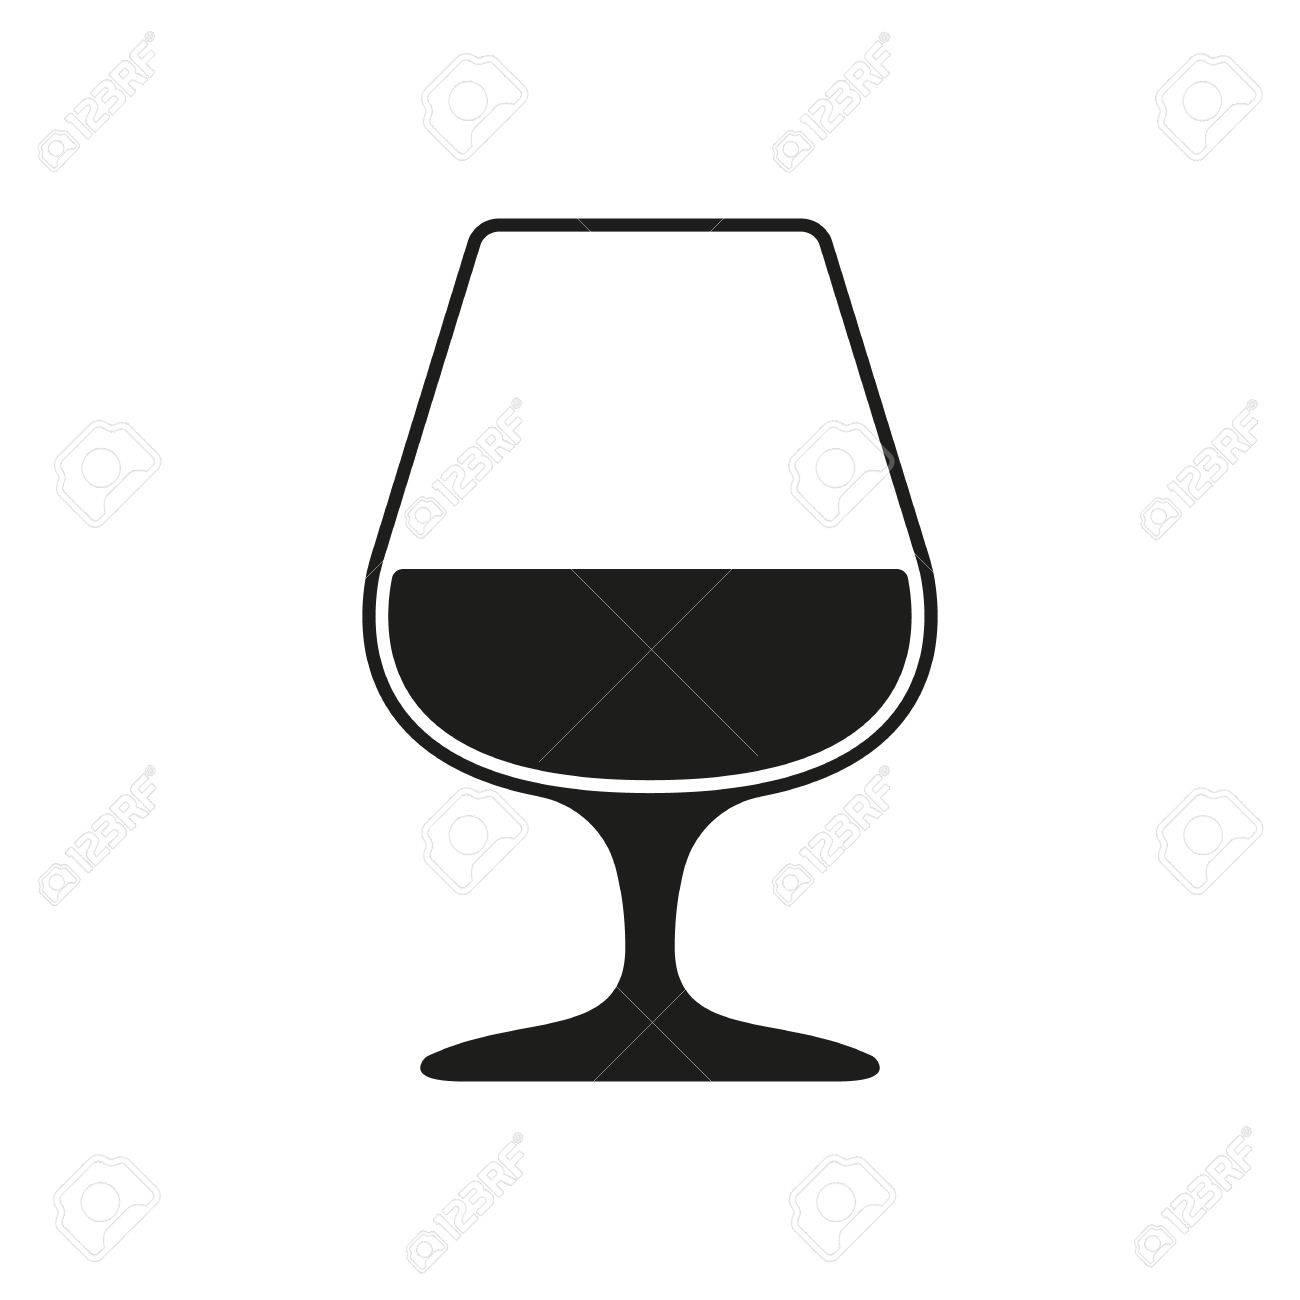 Brandy glass clipart jpg royalty free stock The Glass With Brandy Icon. Brandy Symbol. Flat Vector Illustr ... jpg royalty free stock